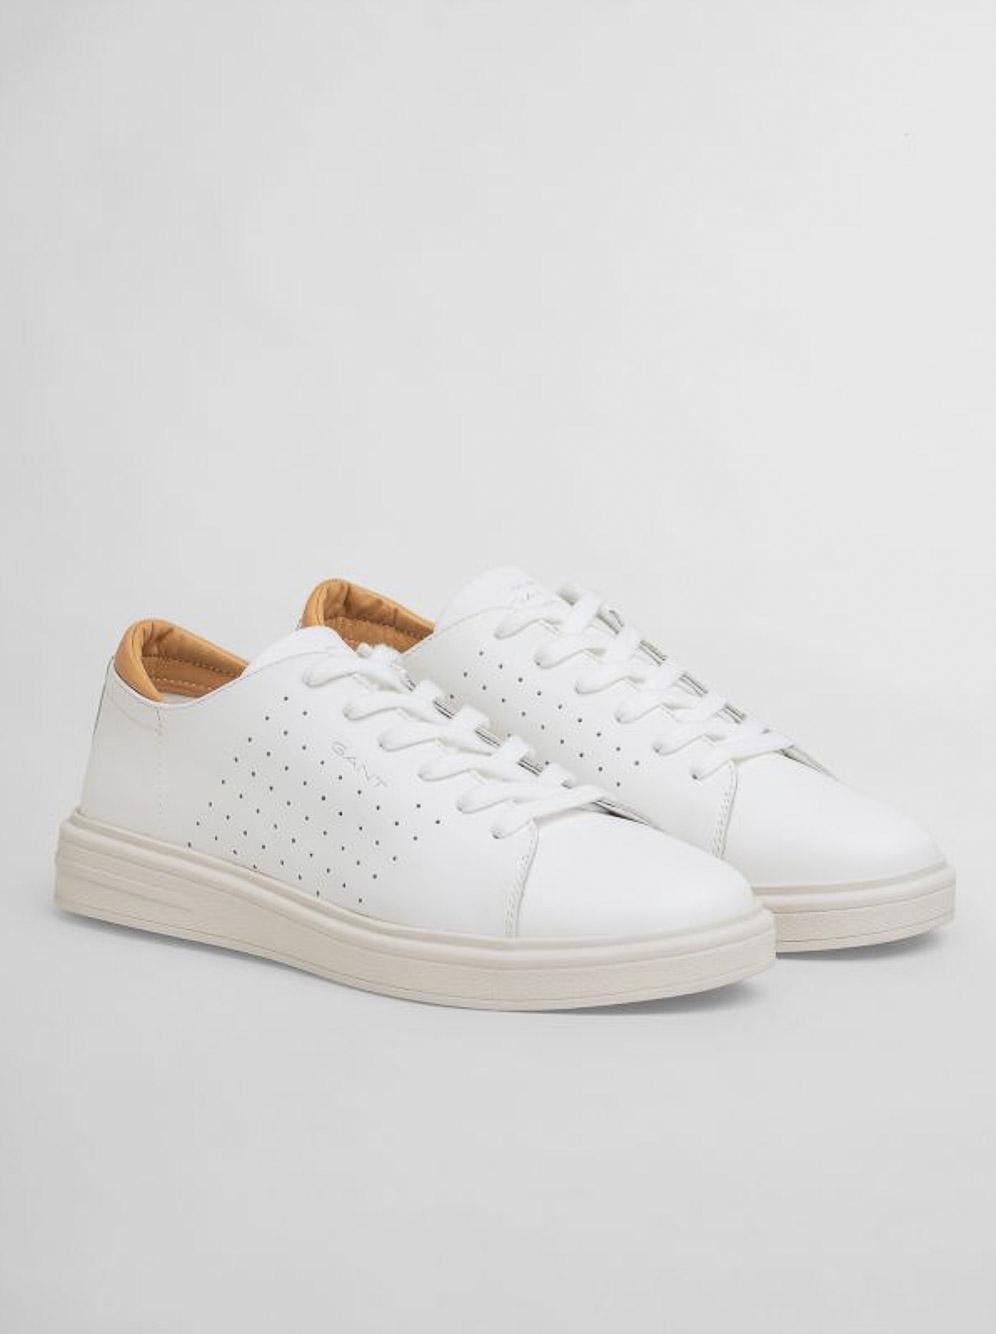 GANT Παπούτσια Sneaker 3GS20631526 ΛΕΥΚΟ